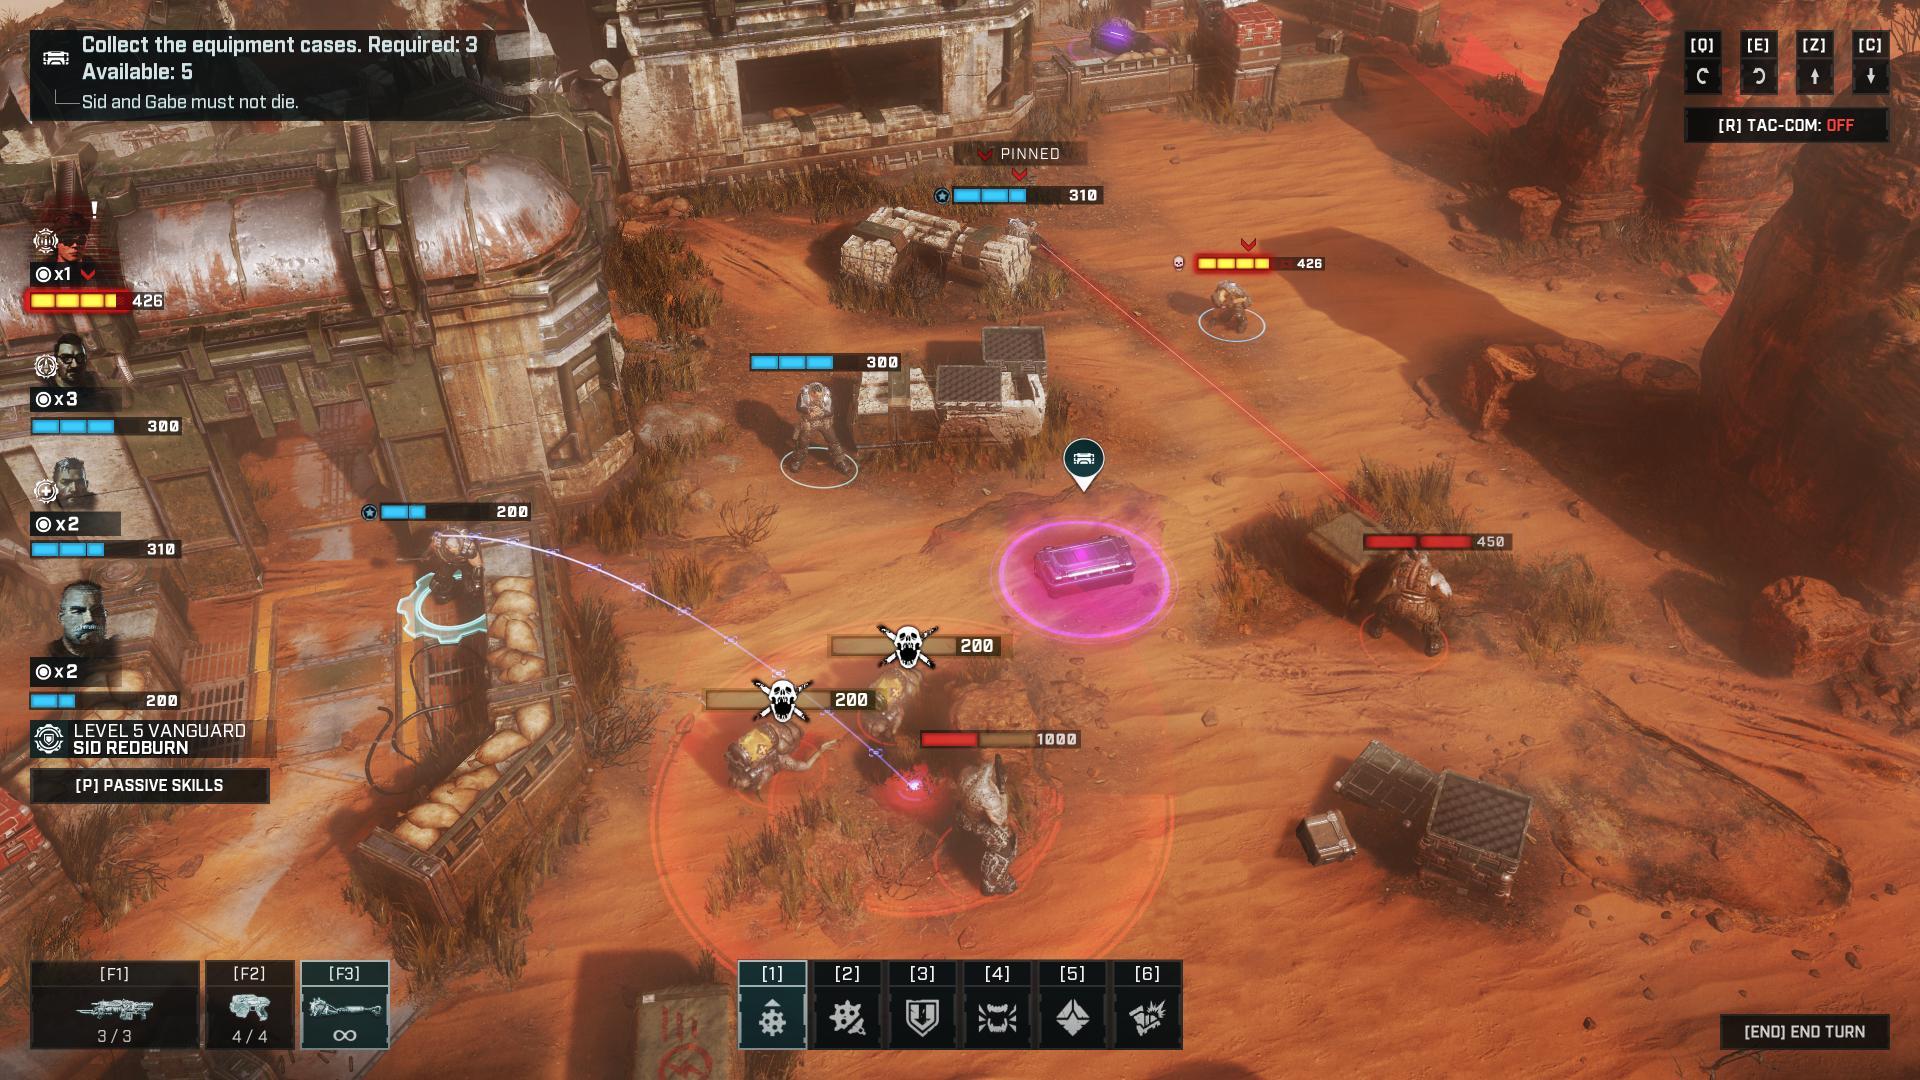 gears tactics img 3 - Recensione Gears Tactics